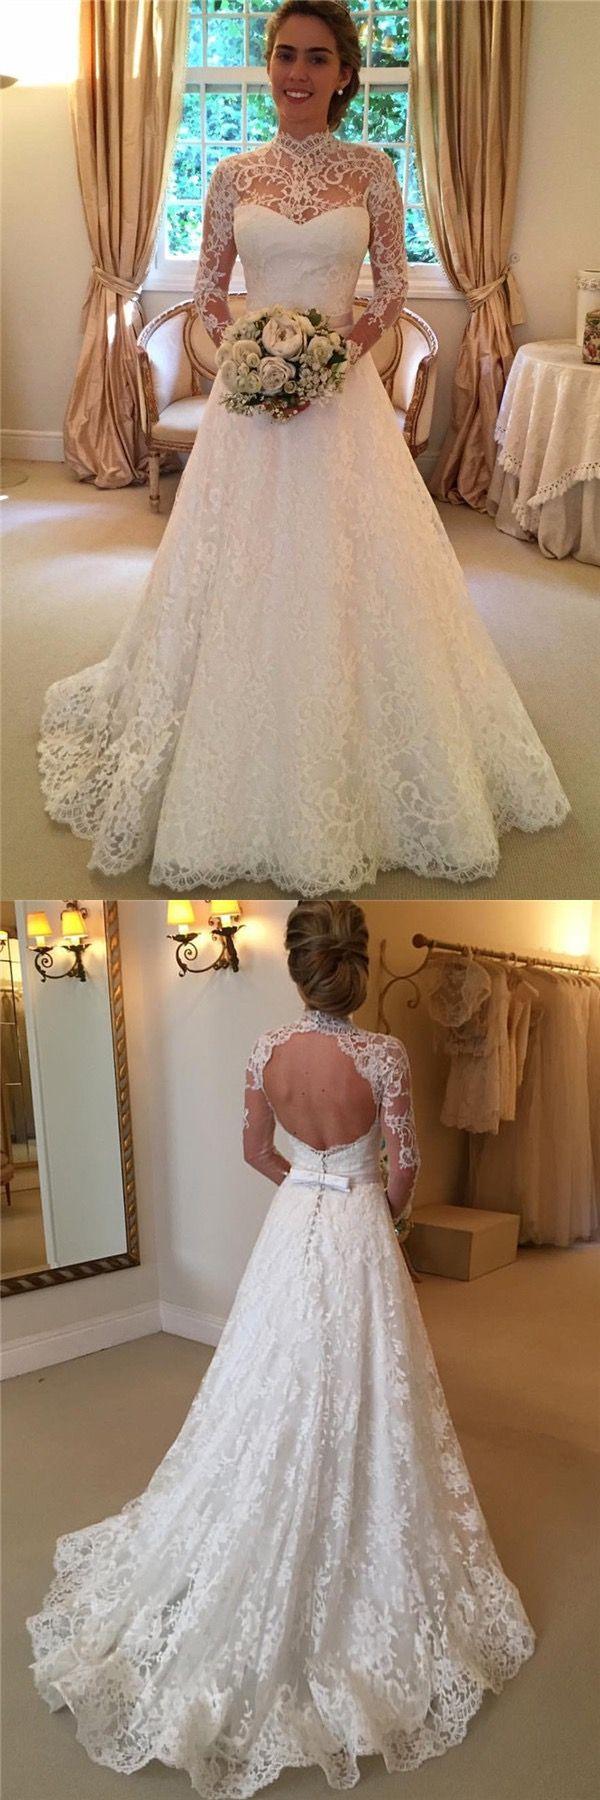 Elegant high neck long sleeves open back long lace wedding dress